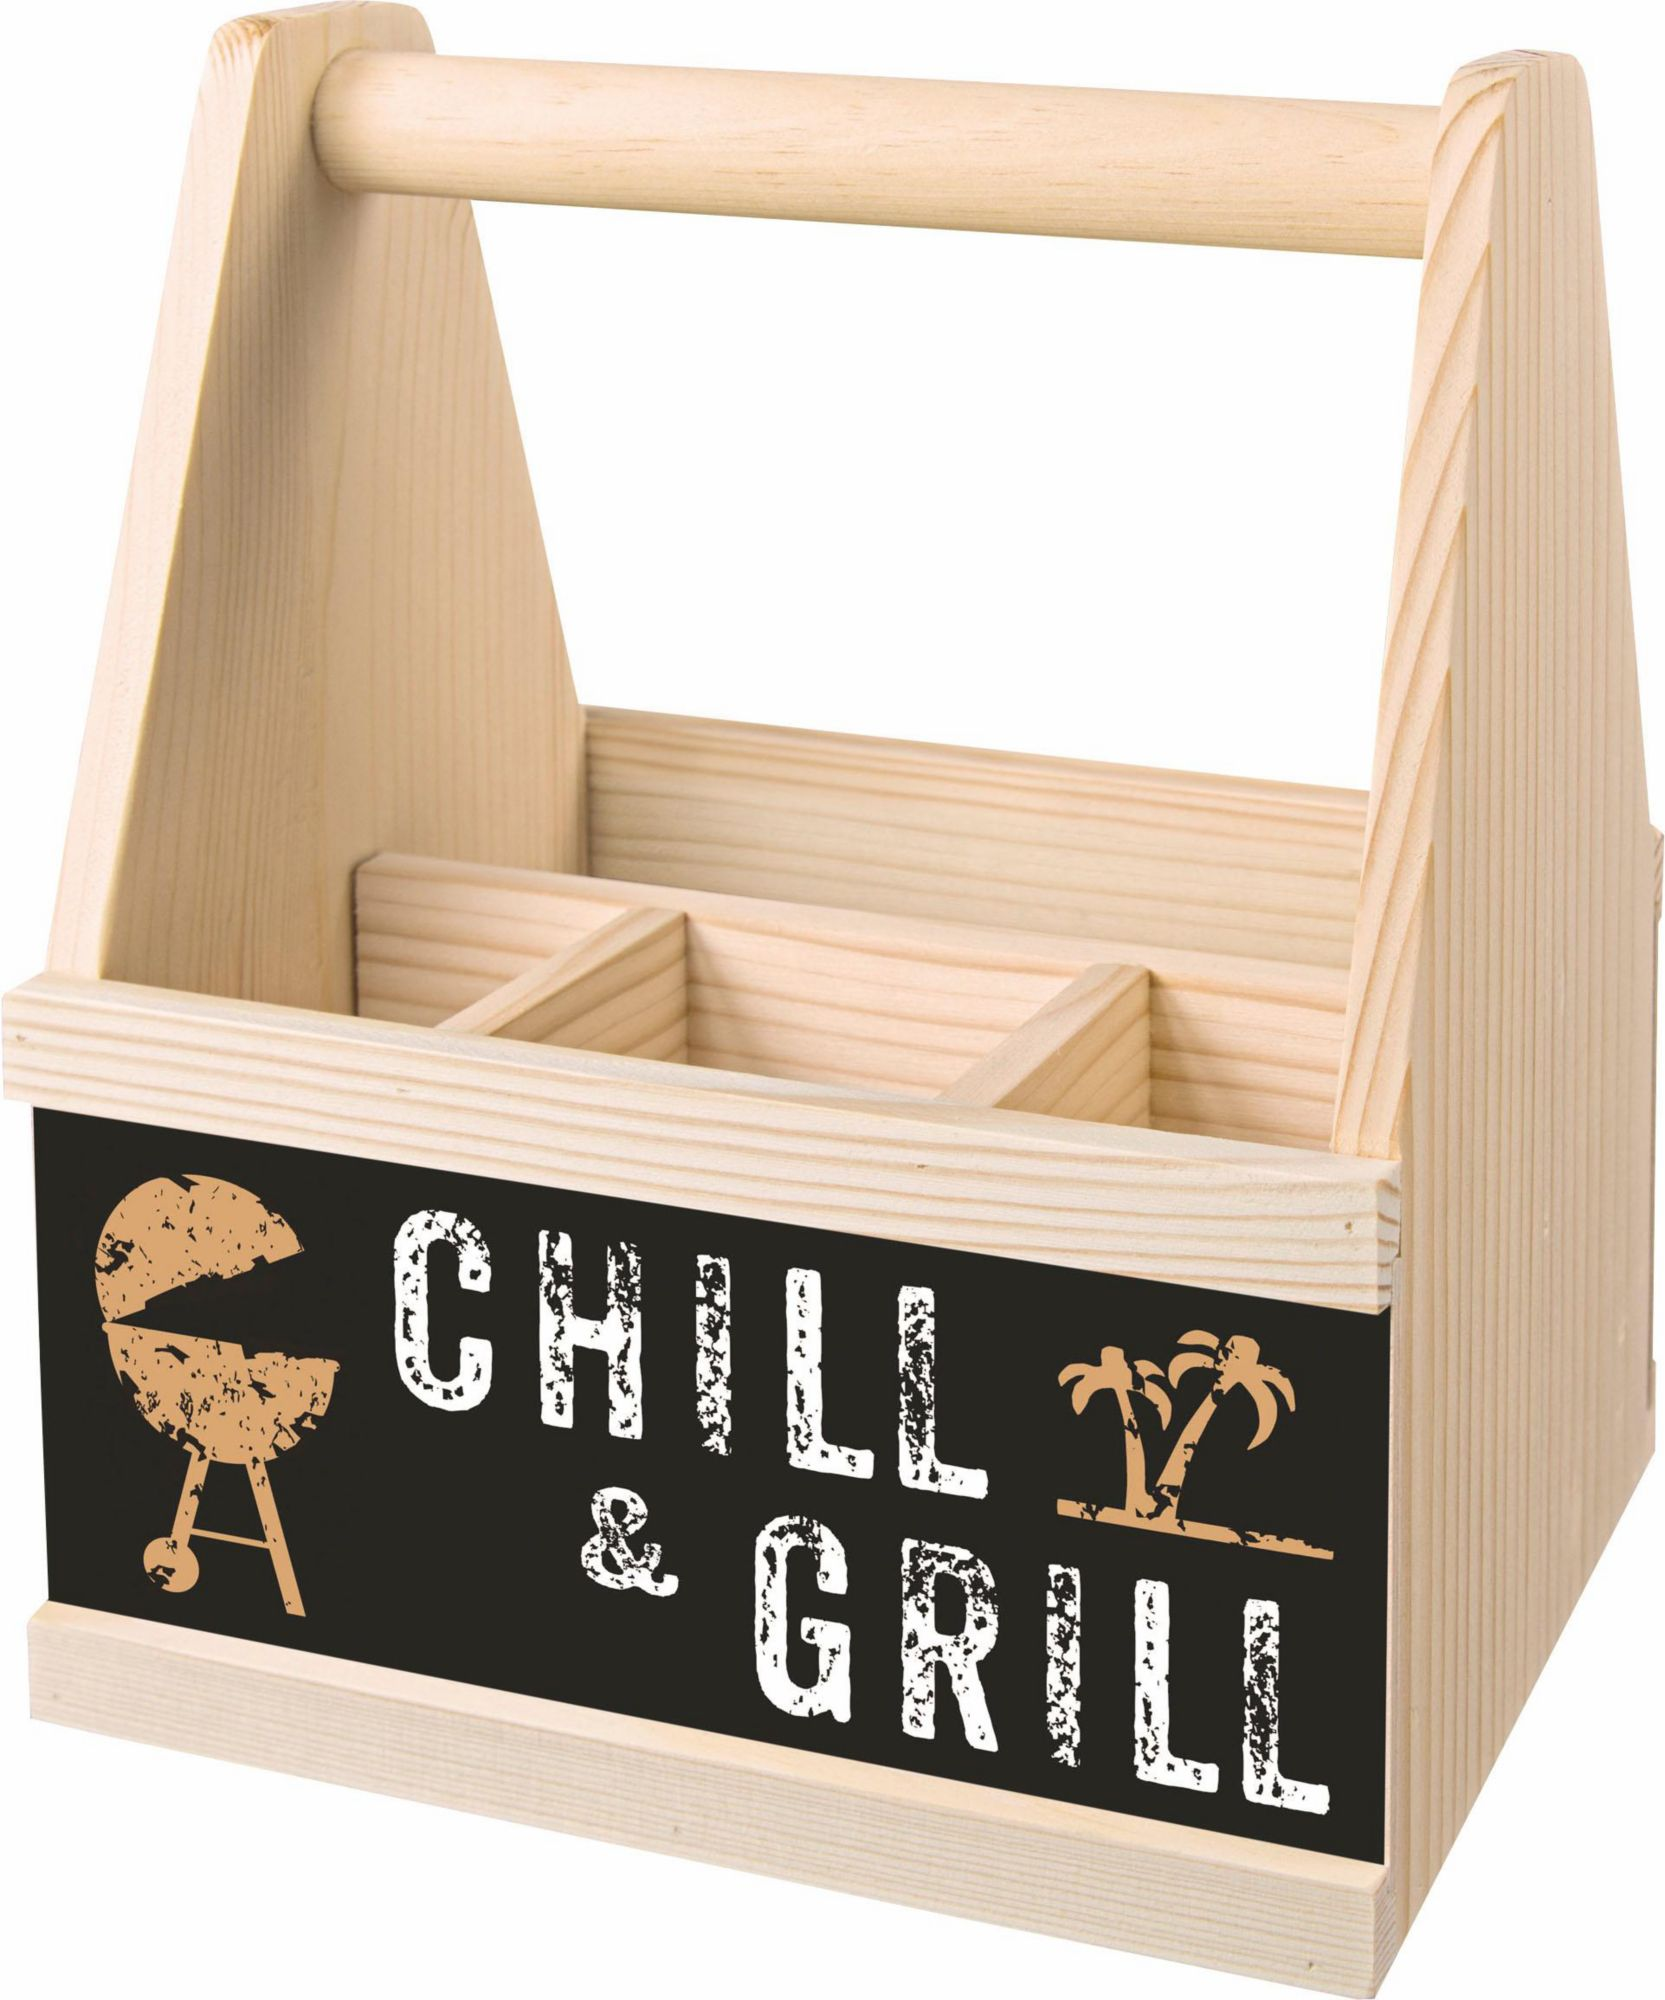 CONTENTO Contento Besteck Caddy »Chill & Grill«